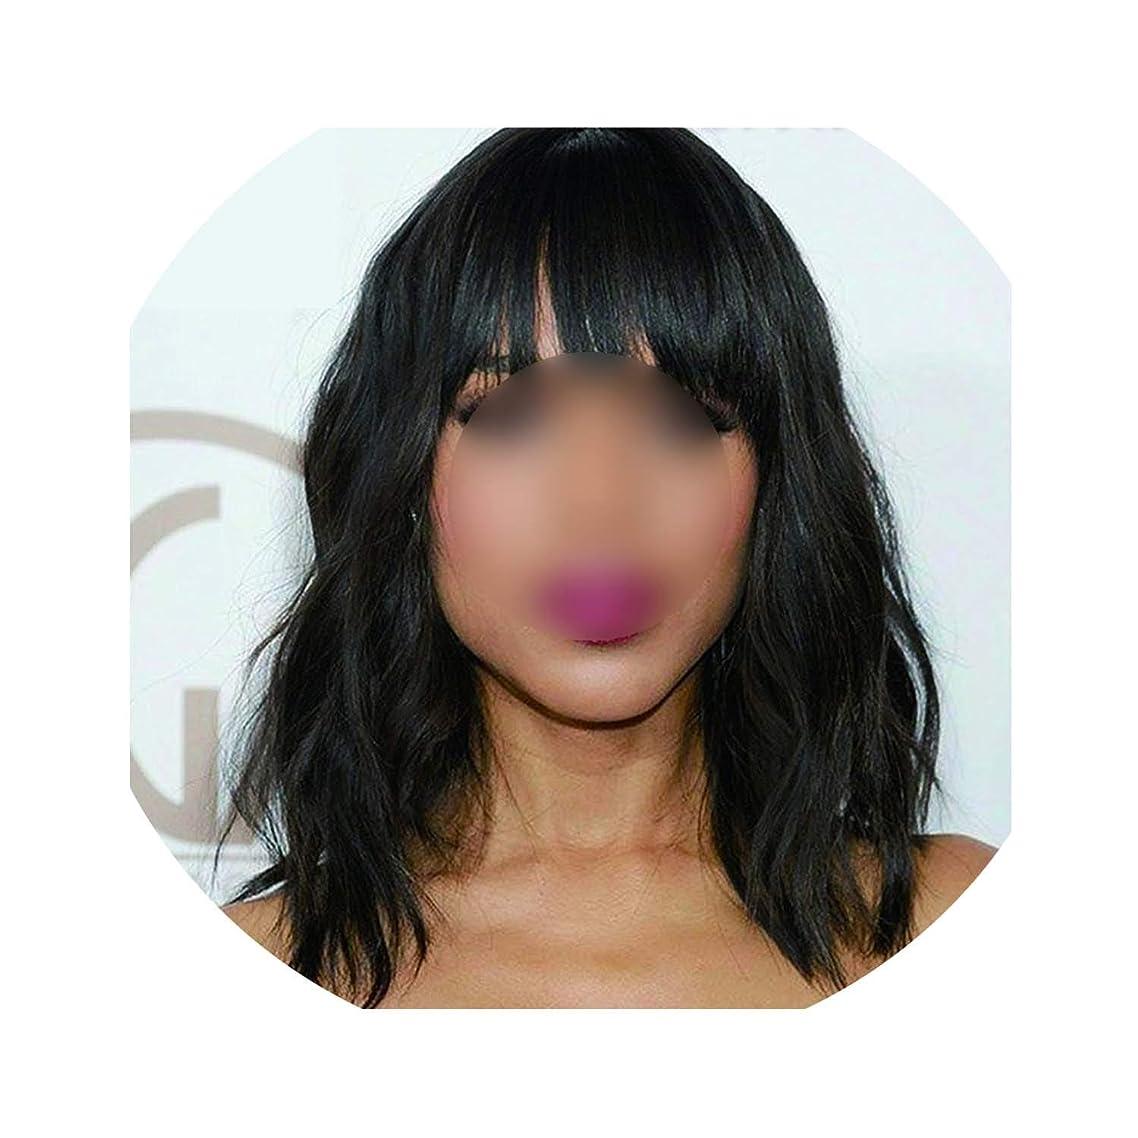 Women'S European and American Wigs, Headgear, Chemical Fiber, Corn, Hot, Bangs, Wig, Hair Sets,1B# (Black)